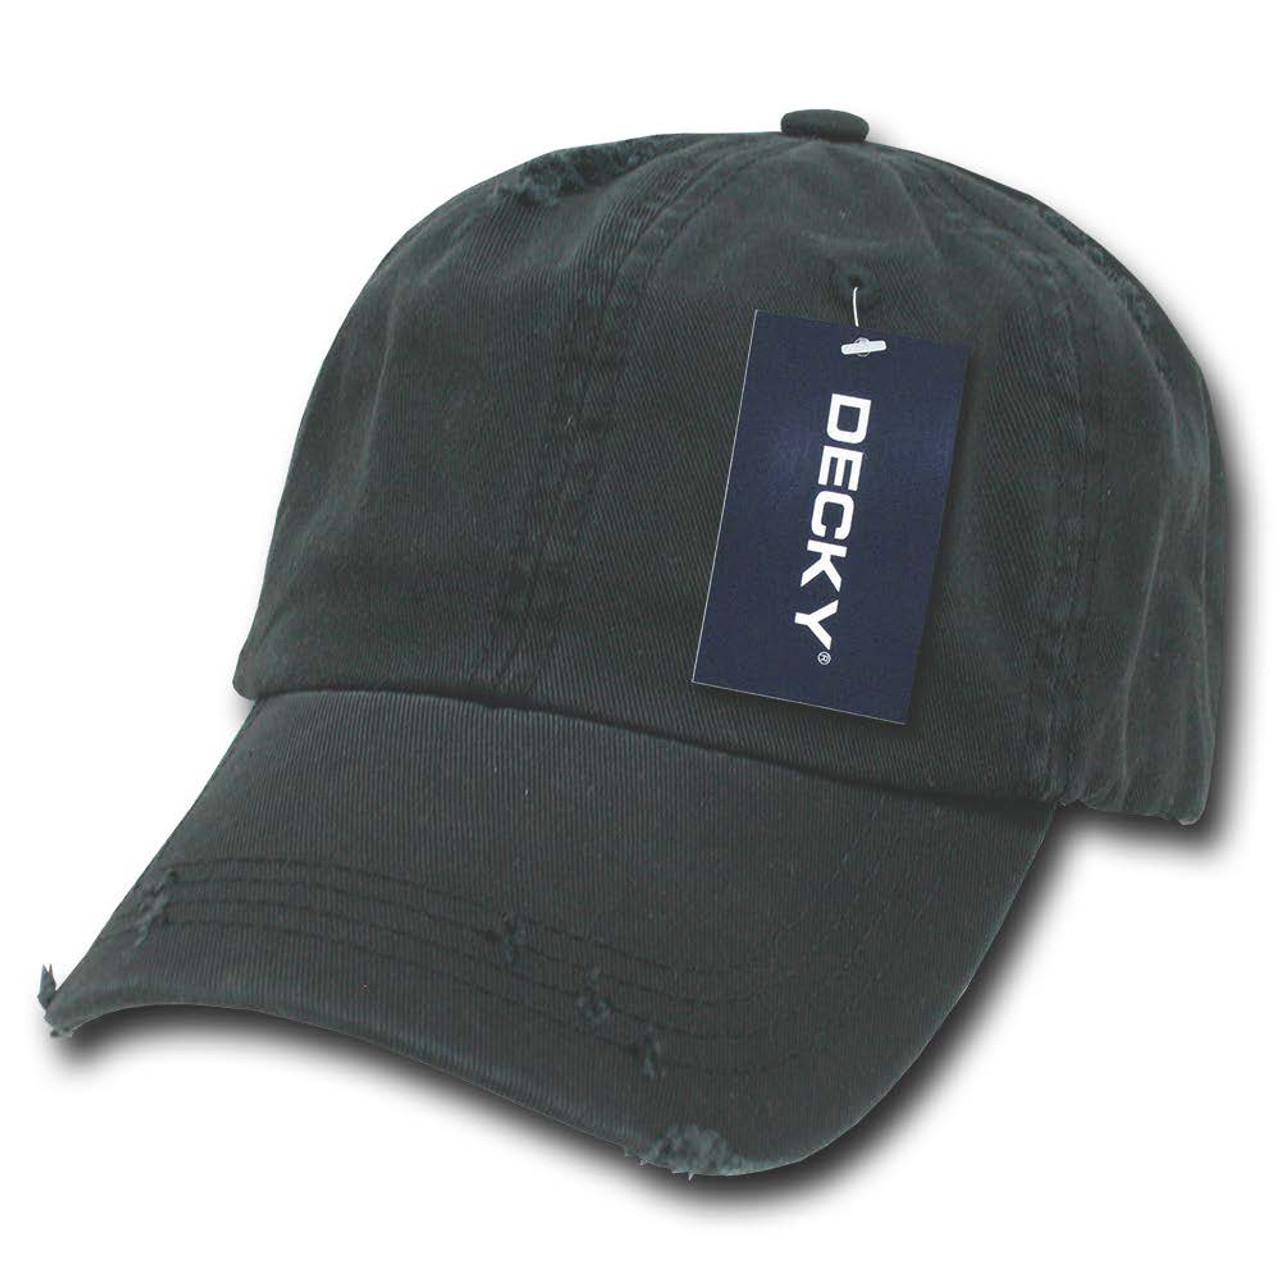 Black Vintage Distressed Retro Polo Low Profile Baseball Cap Golf Hat Hats  Caps 0ae47f9d48f